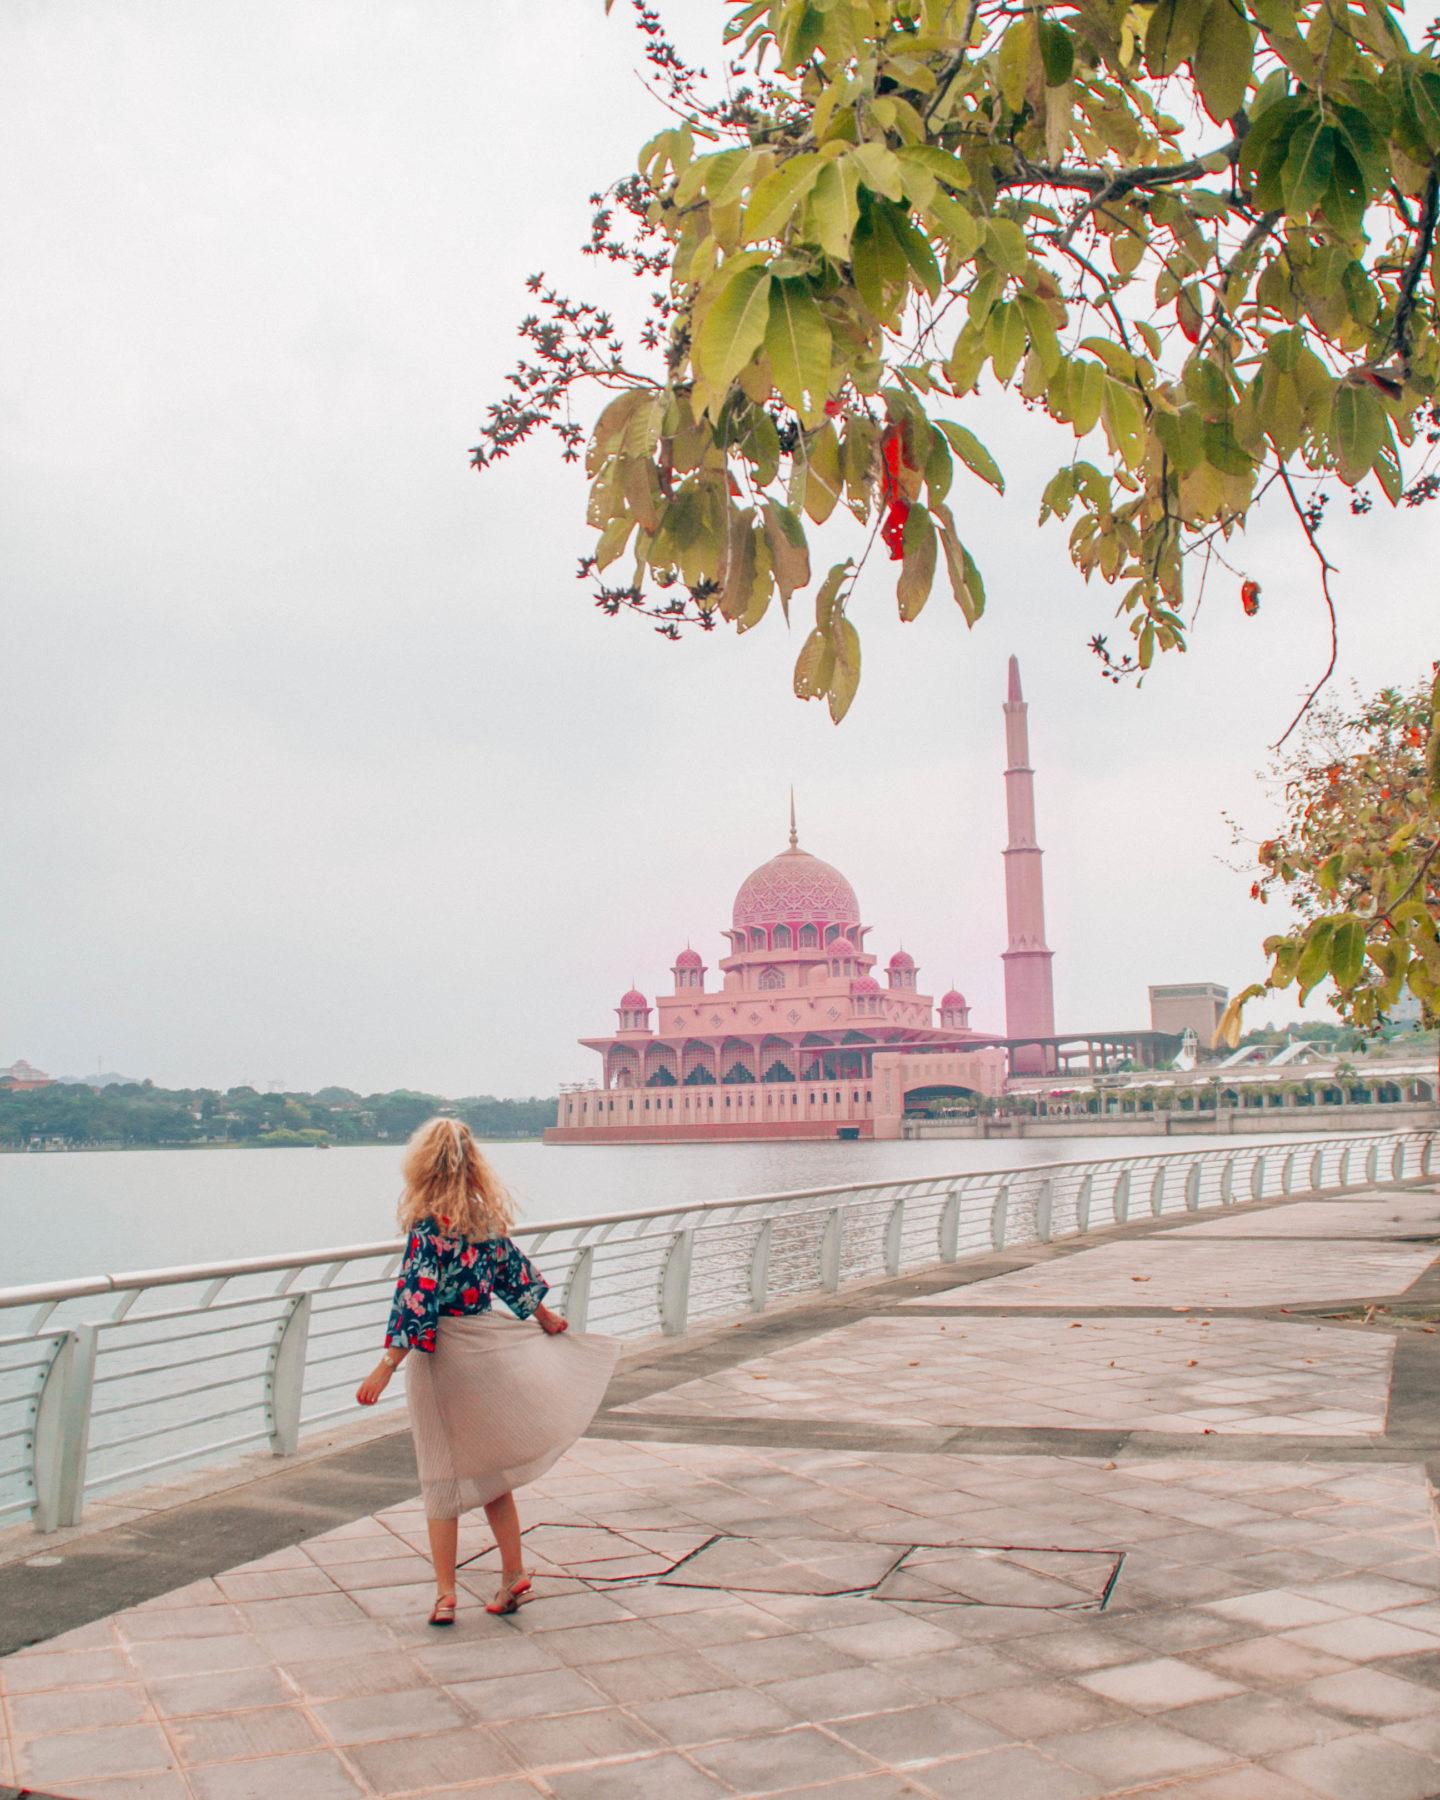 Pink Putra mosque in Kuala Lumpur